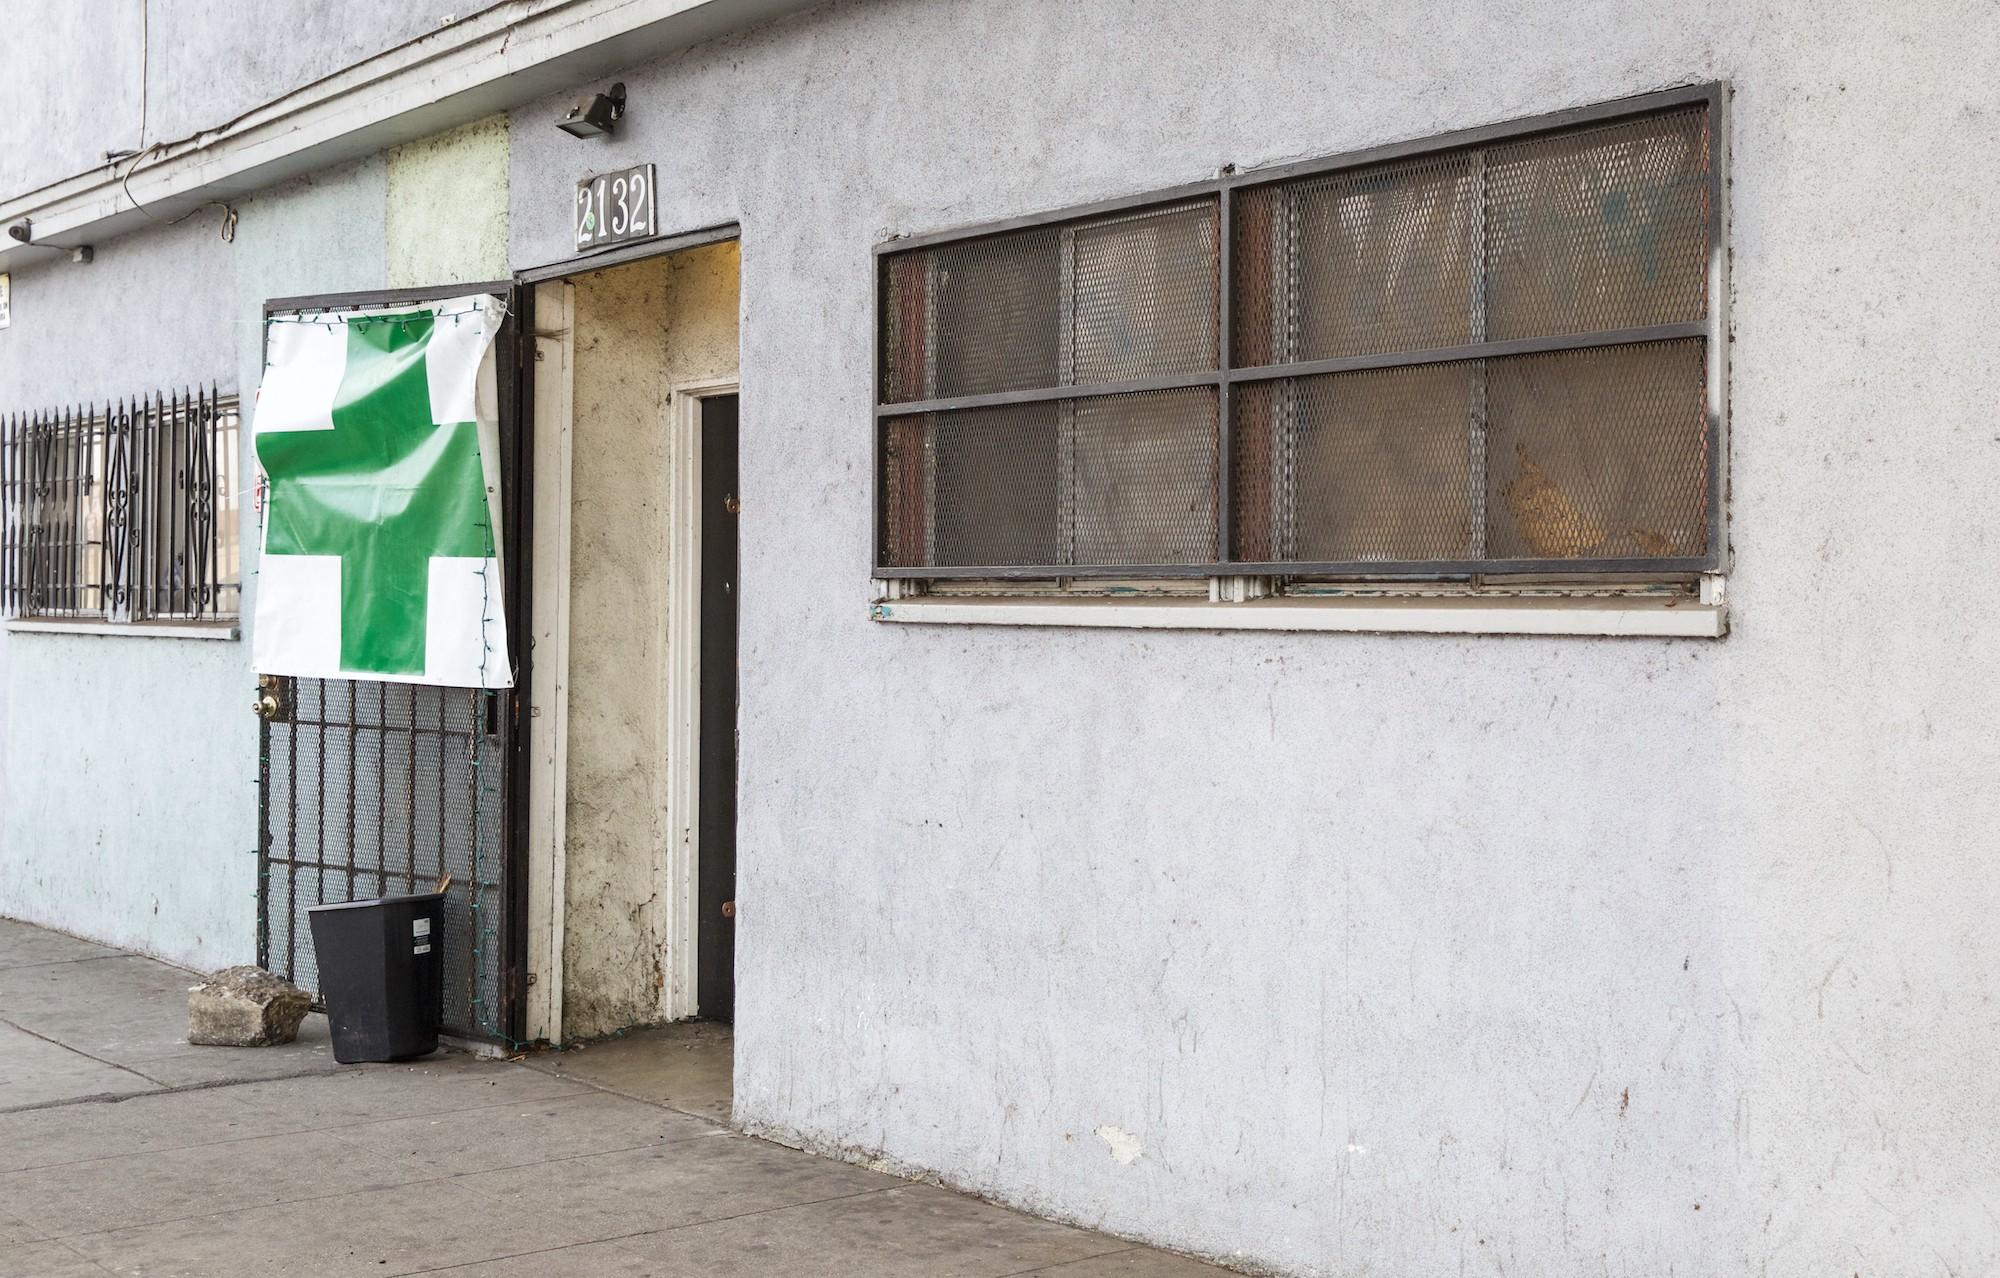 Dispensary in Los Angeles, CA